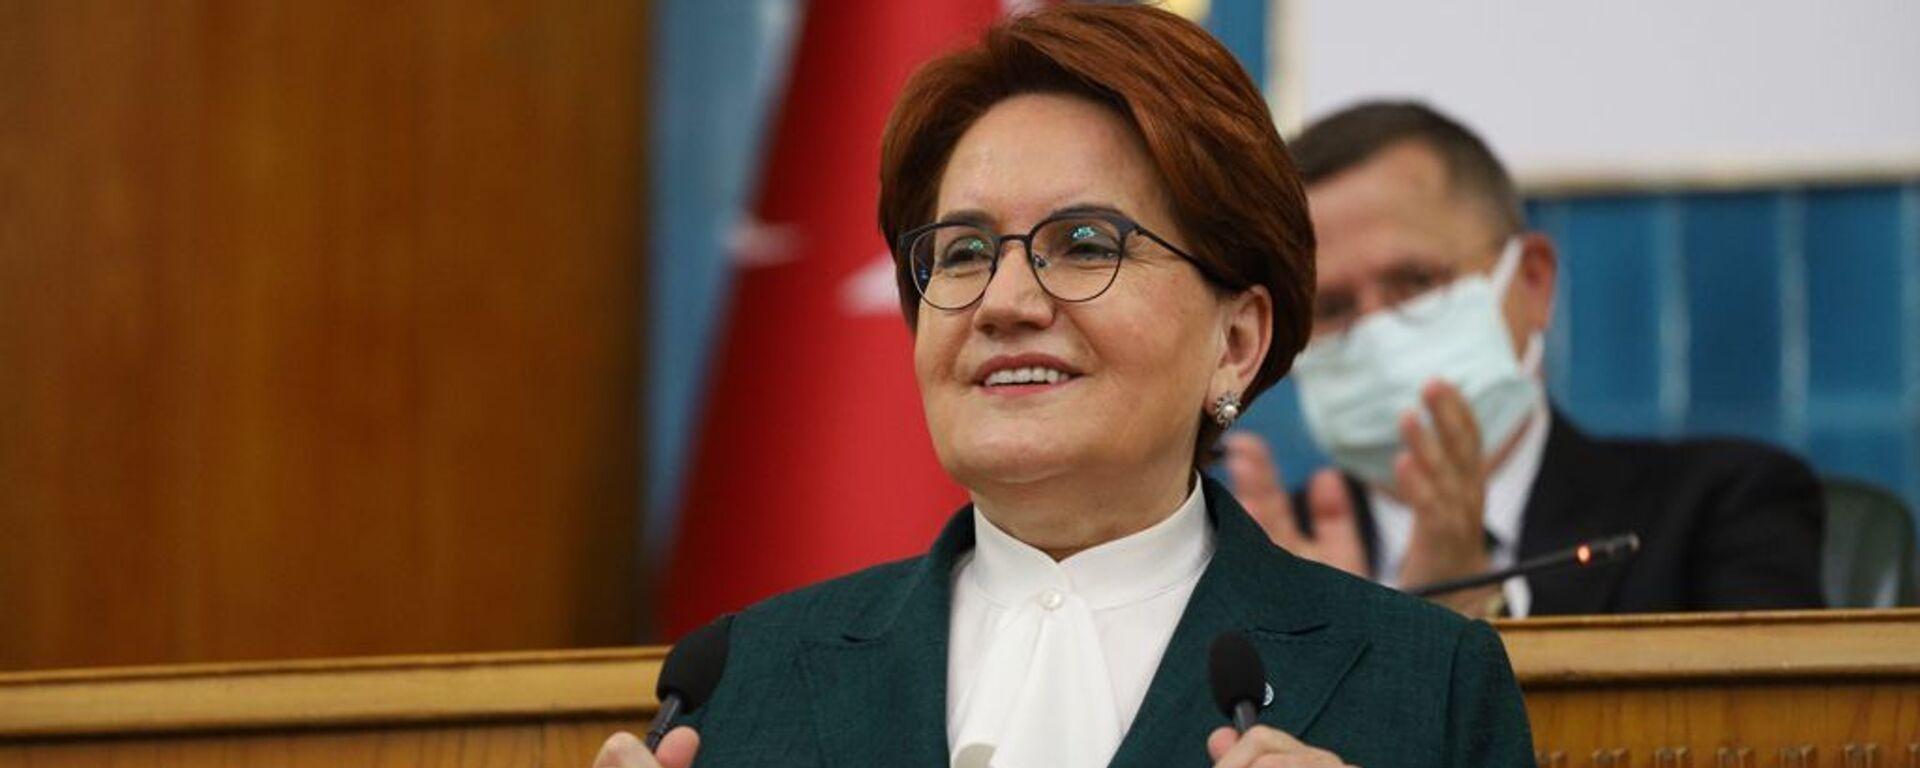 İYİ Parti lideri Meral Akşener - Sputnik Türkiye, 1920, 26.05.2021